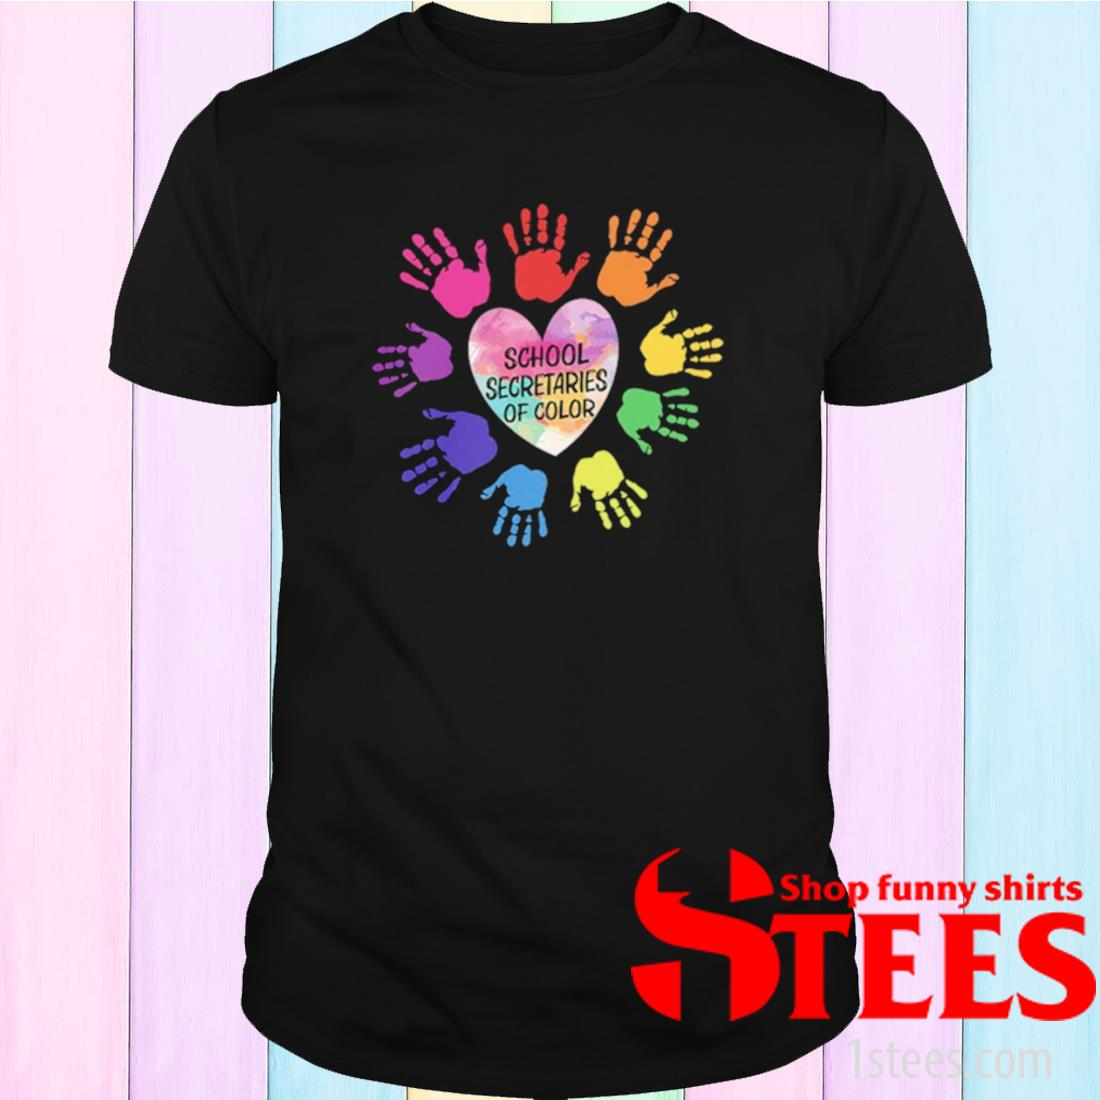 School Secretaries Of Color Shirt